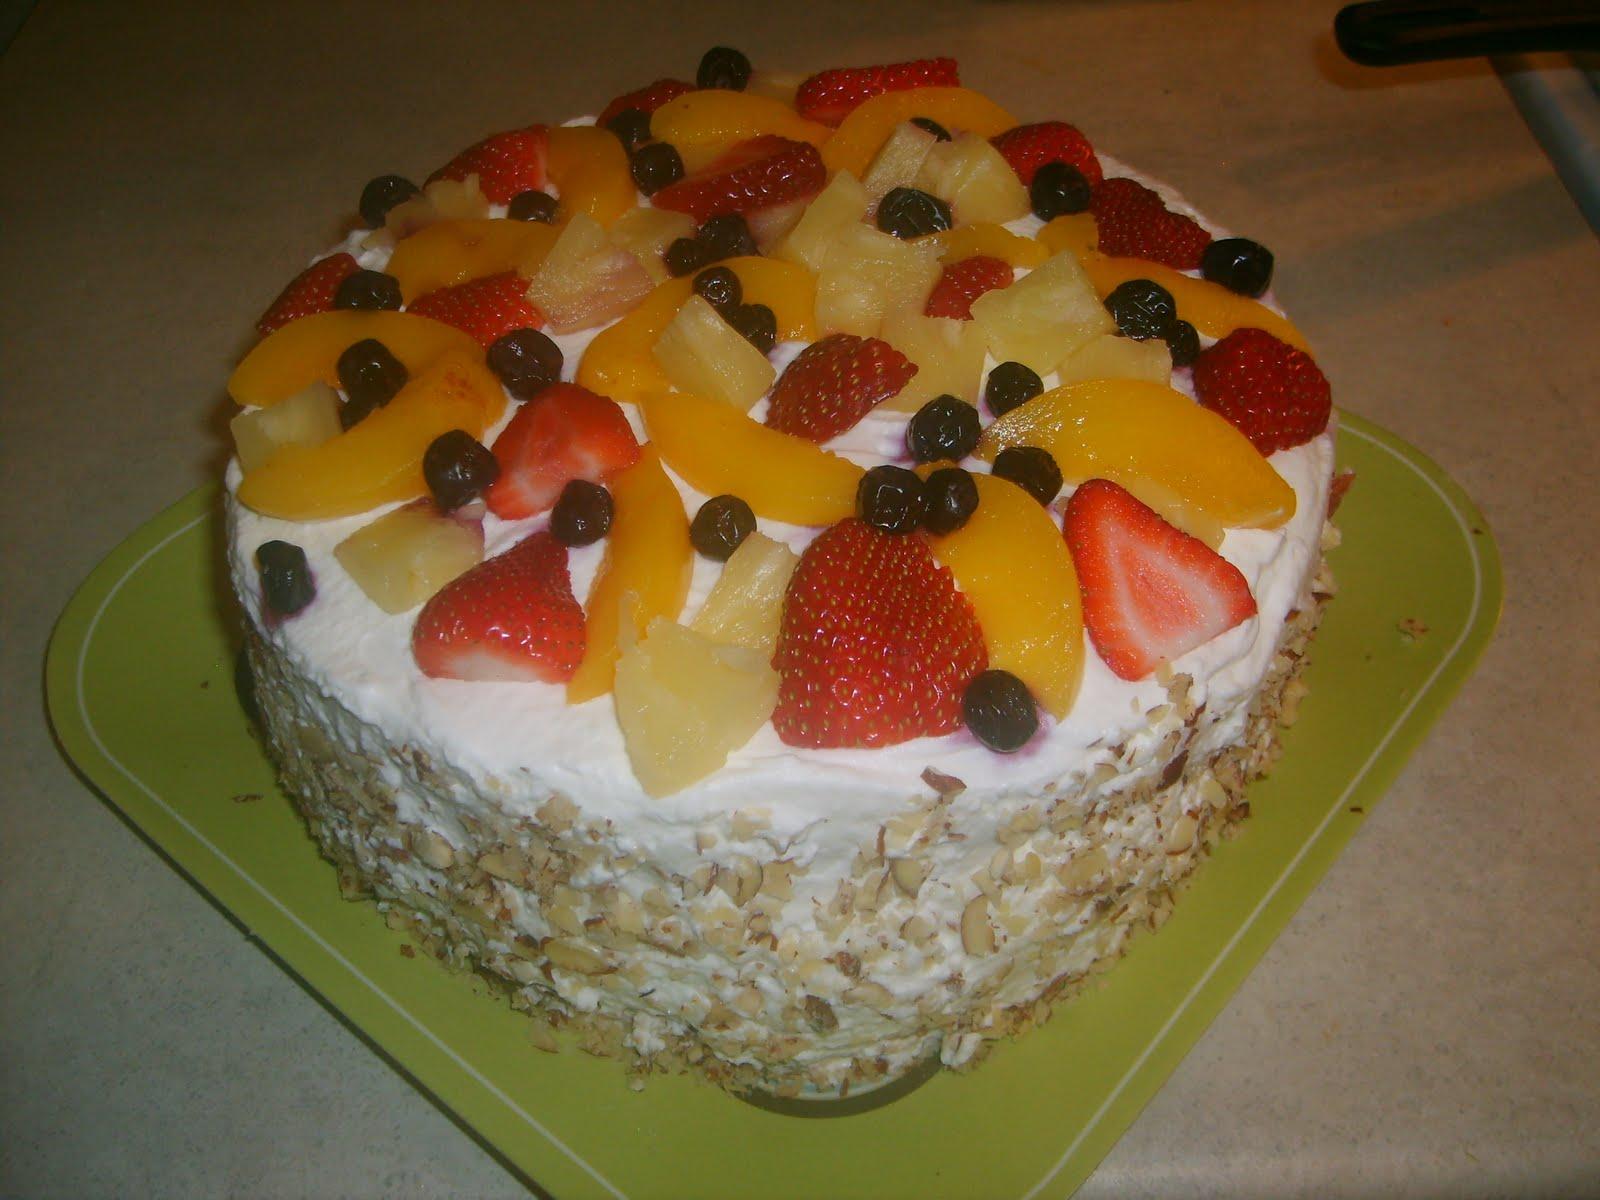 Tasty Creations: Whipped cream fruit cake